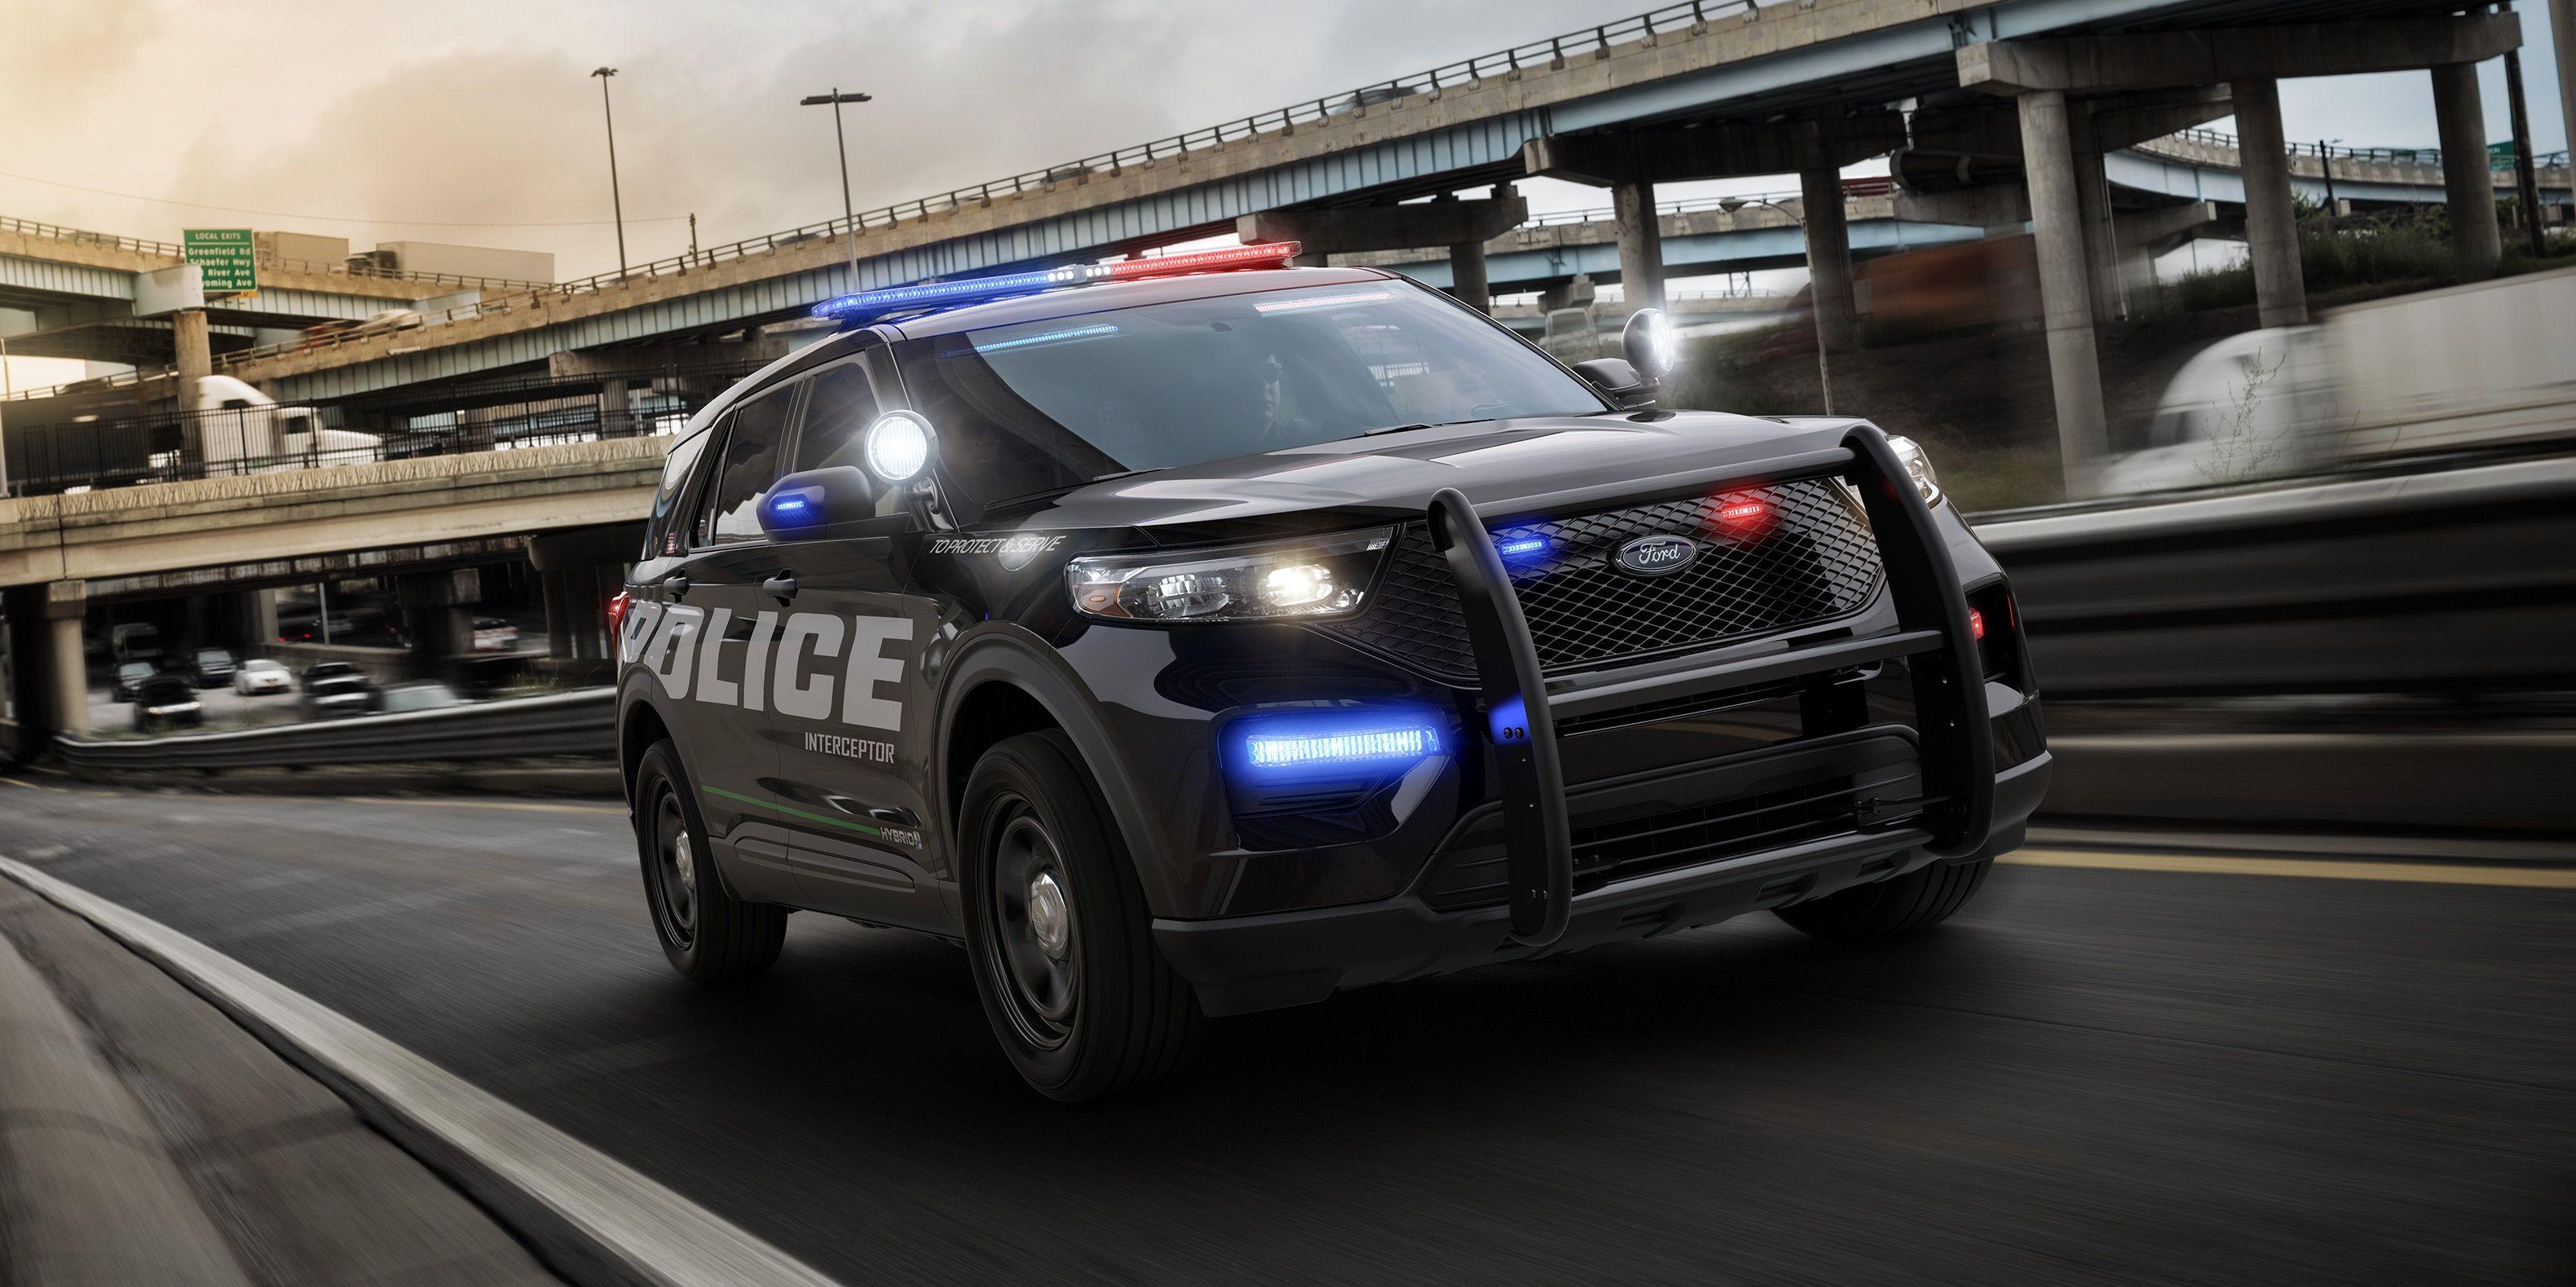 2020 Ford Explorer Preview Police Interceptor Utility Fully Revealed